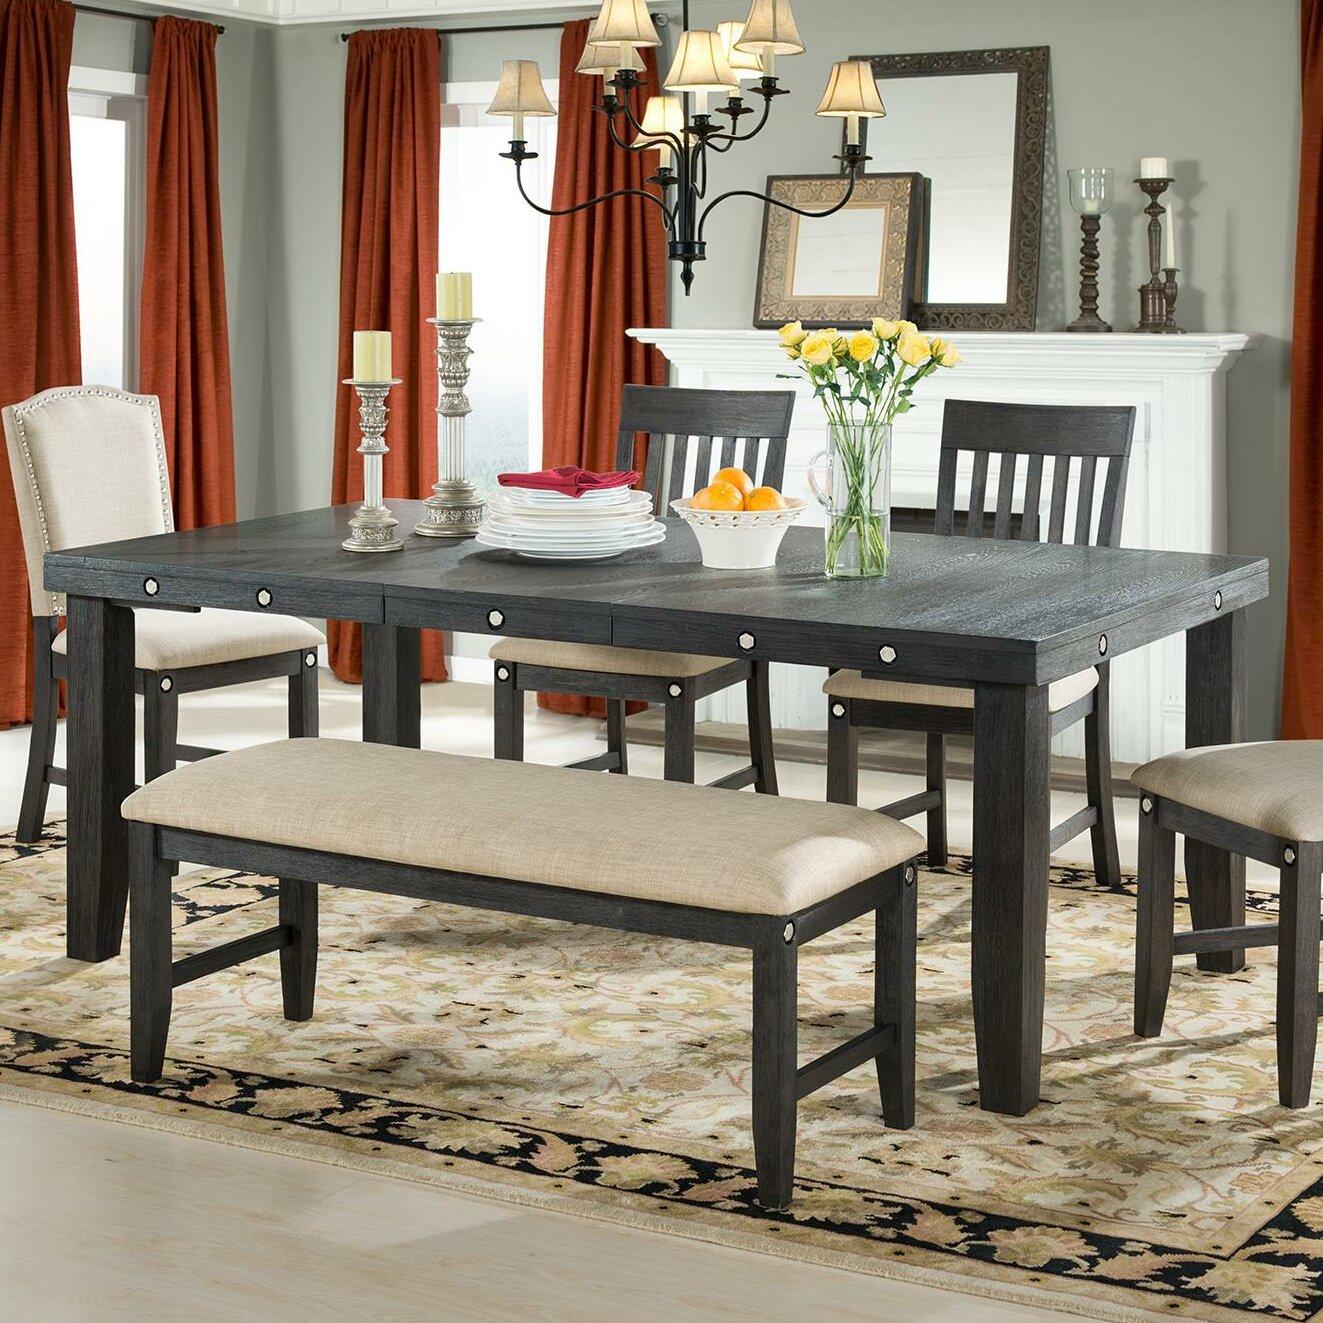 vilohomeinc marseille provence extendable dining table wayfair. Black Bedroom Furniture Sets. Home Design Ideas